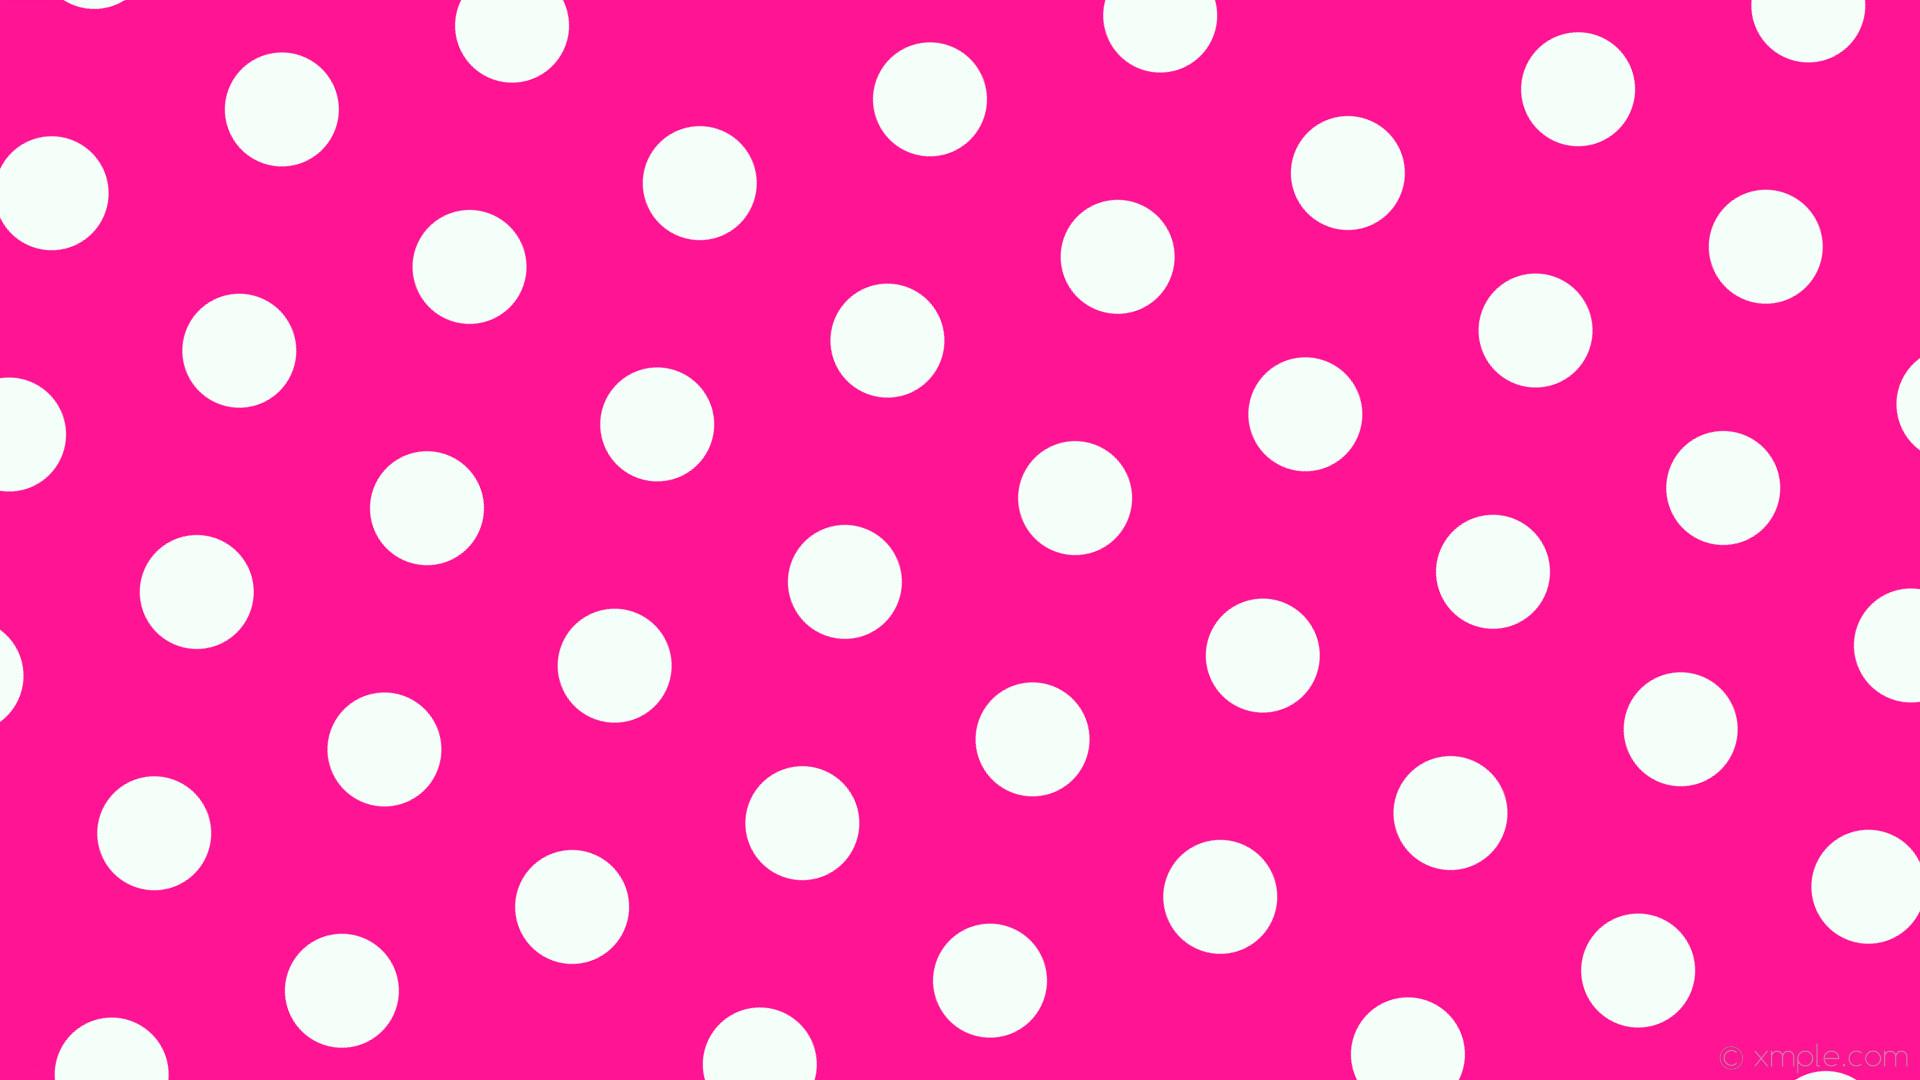 Pink And White Polka Dot Wallpaper